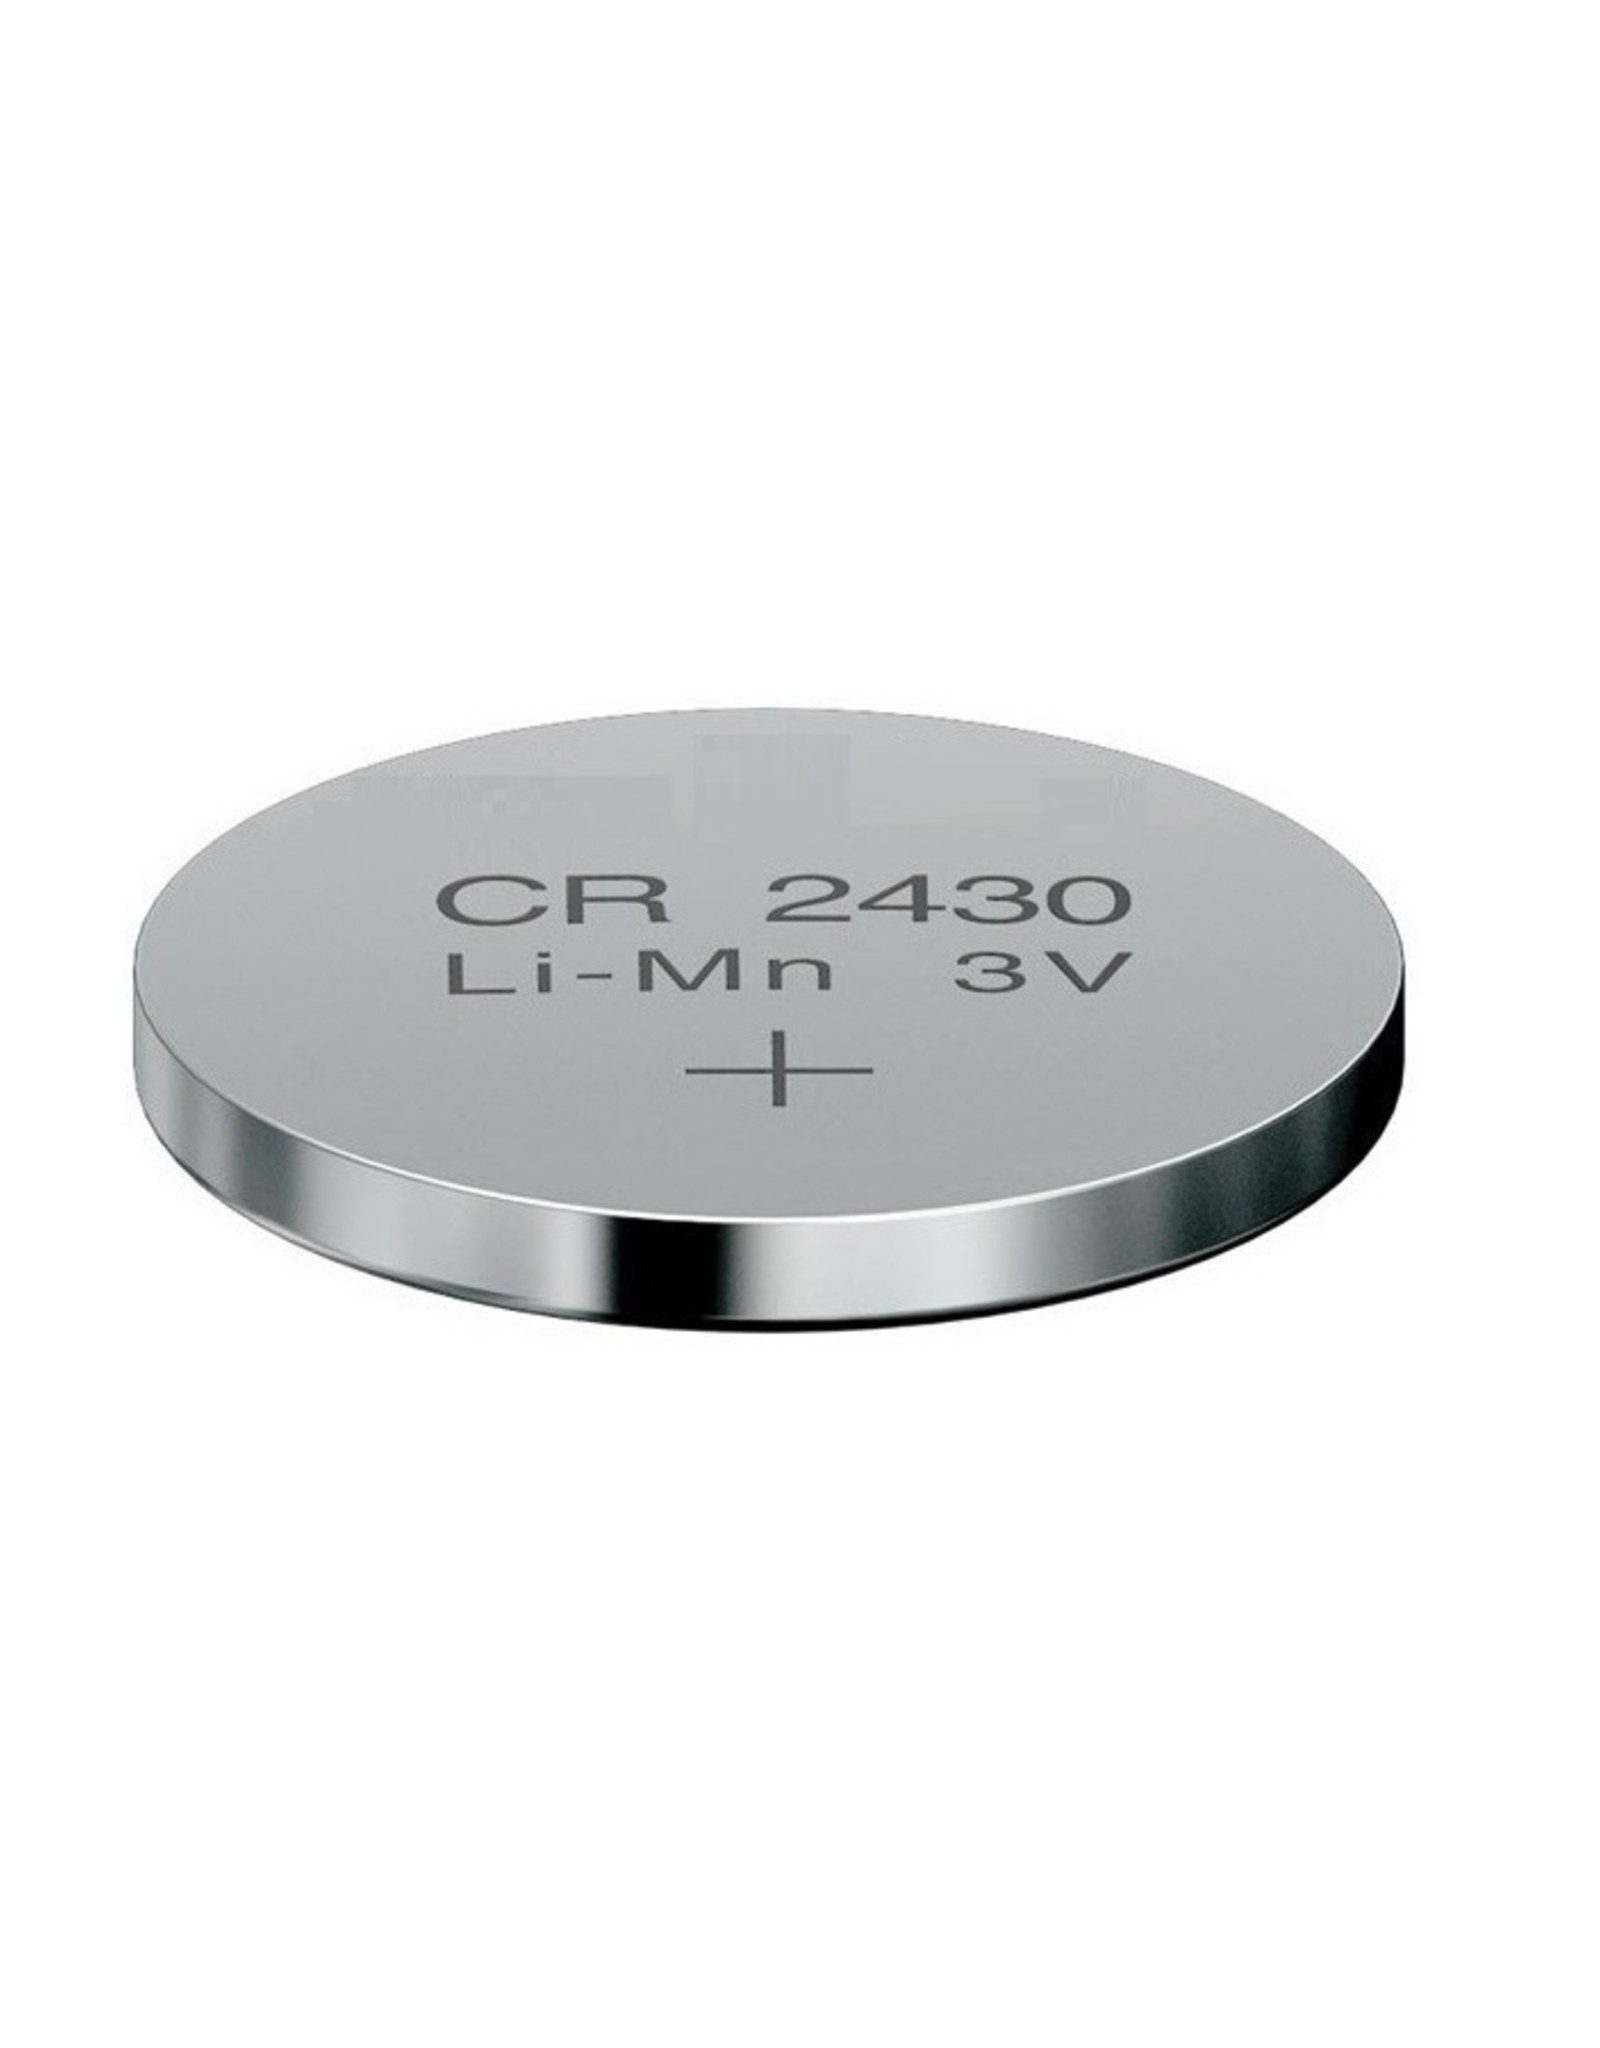 Duracell 3 Volt DR2430 knoopcel reserve batterij